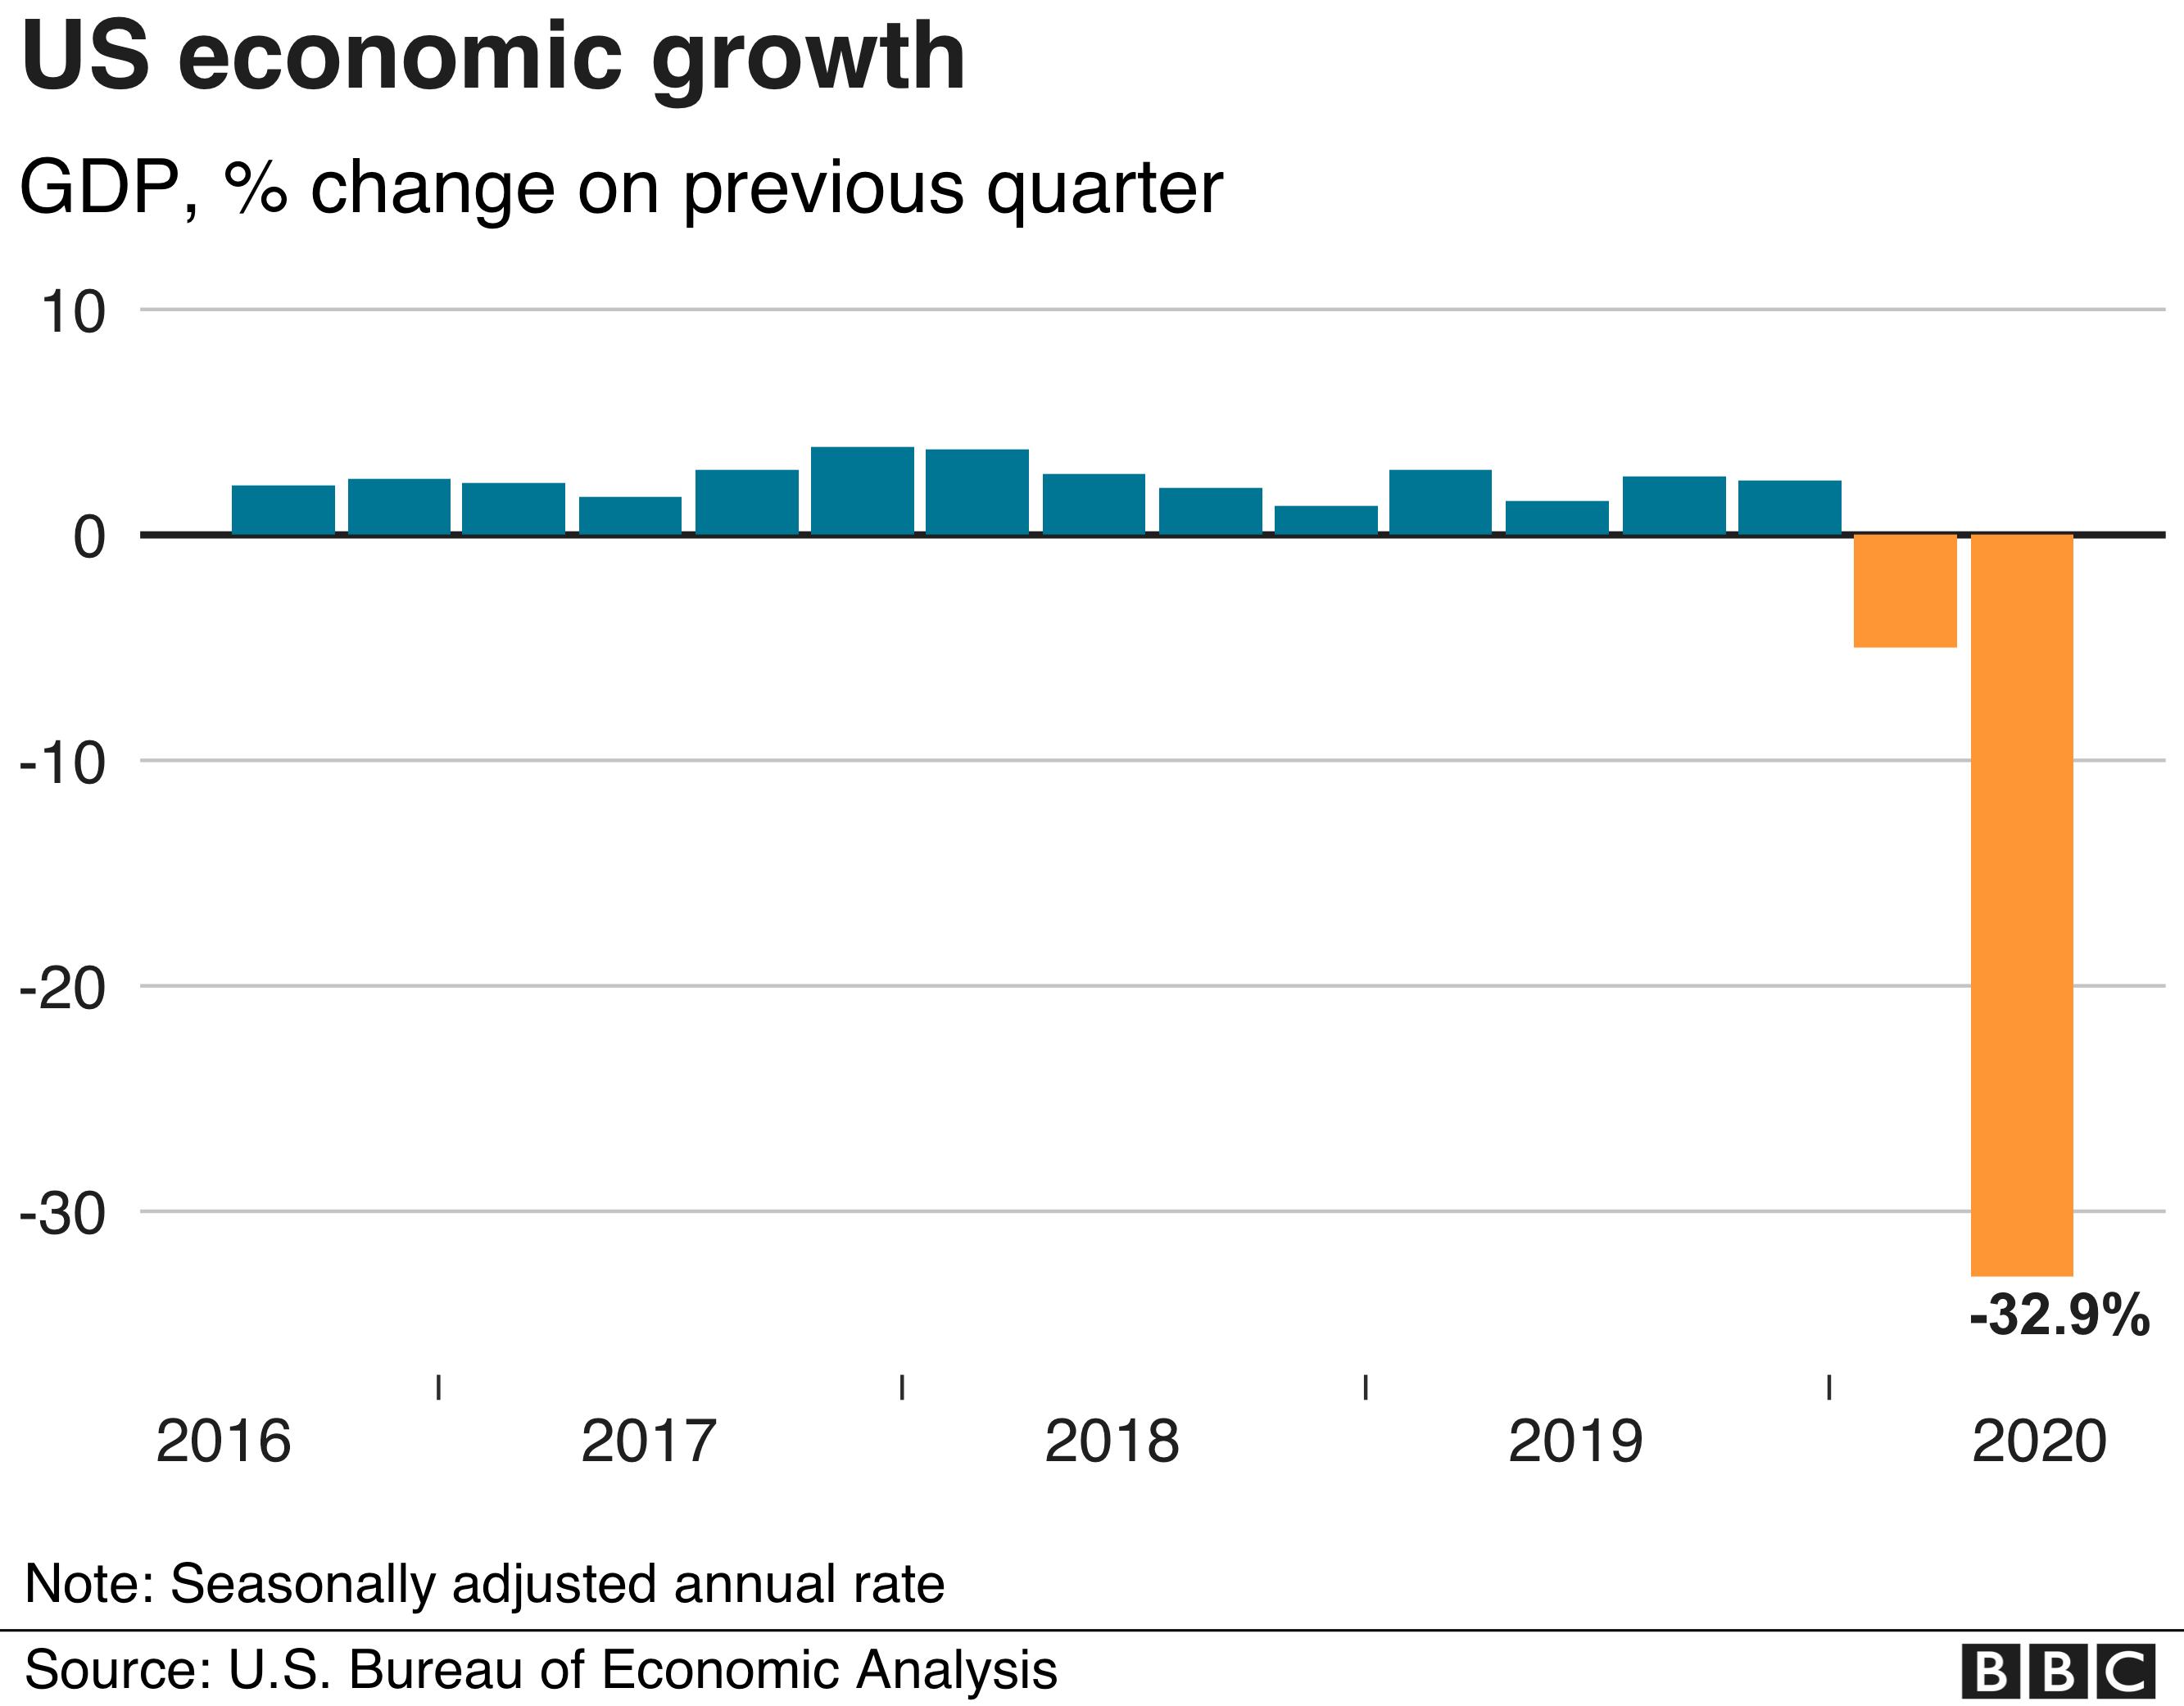 Coronavirus: US economy sees sharpest contraction in decades - BBC News